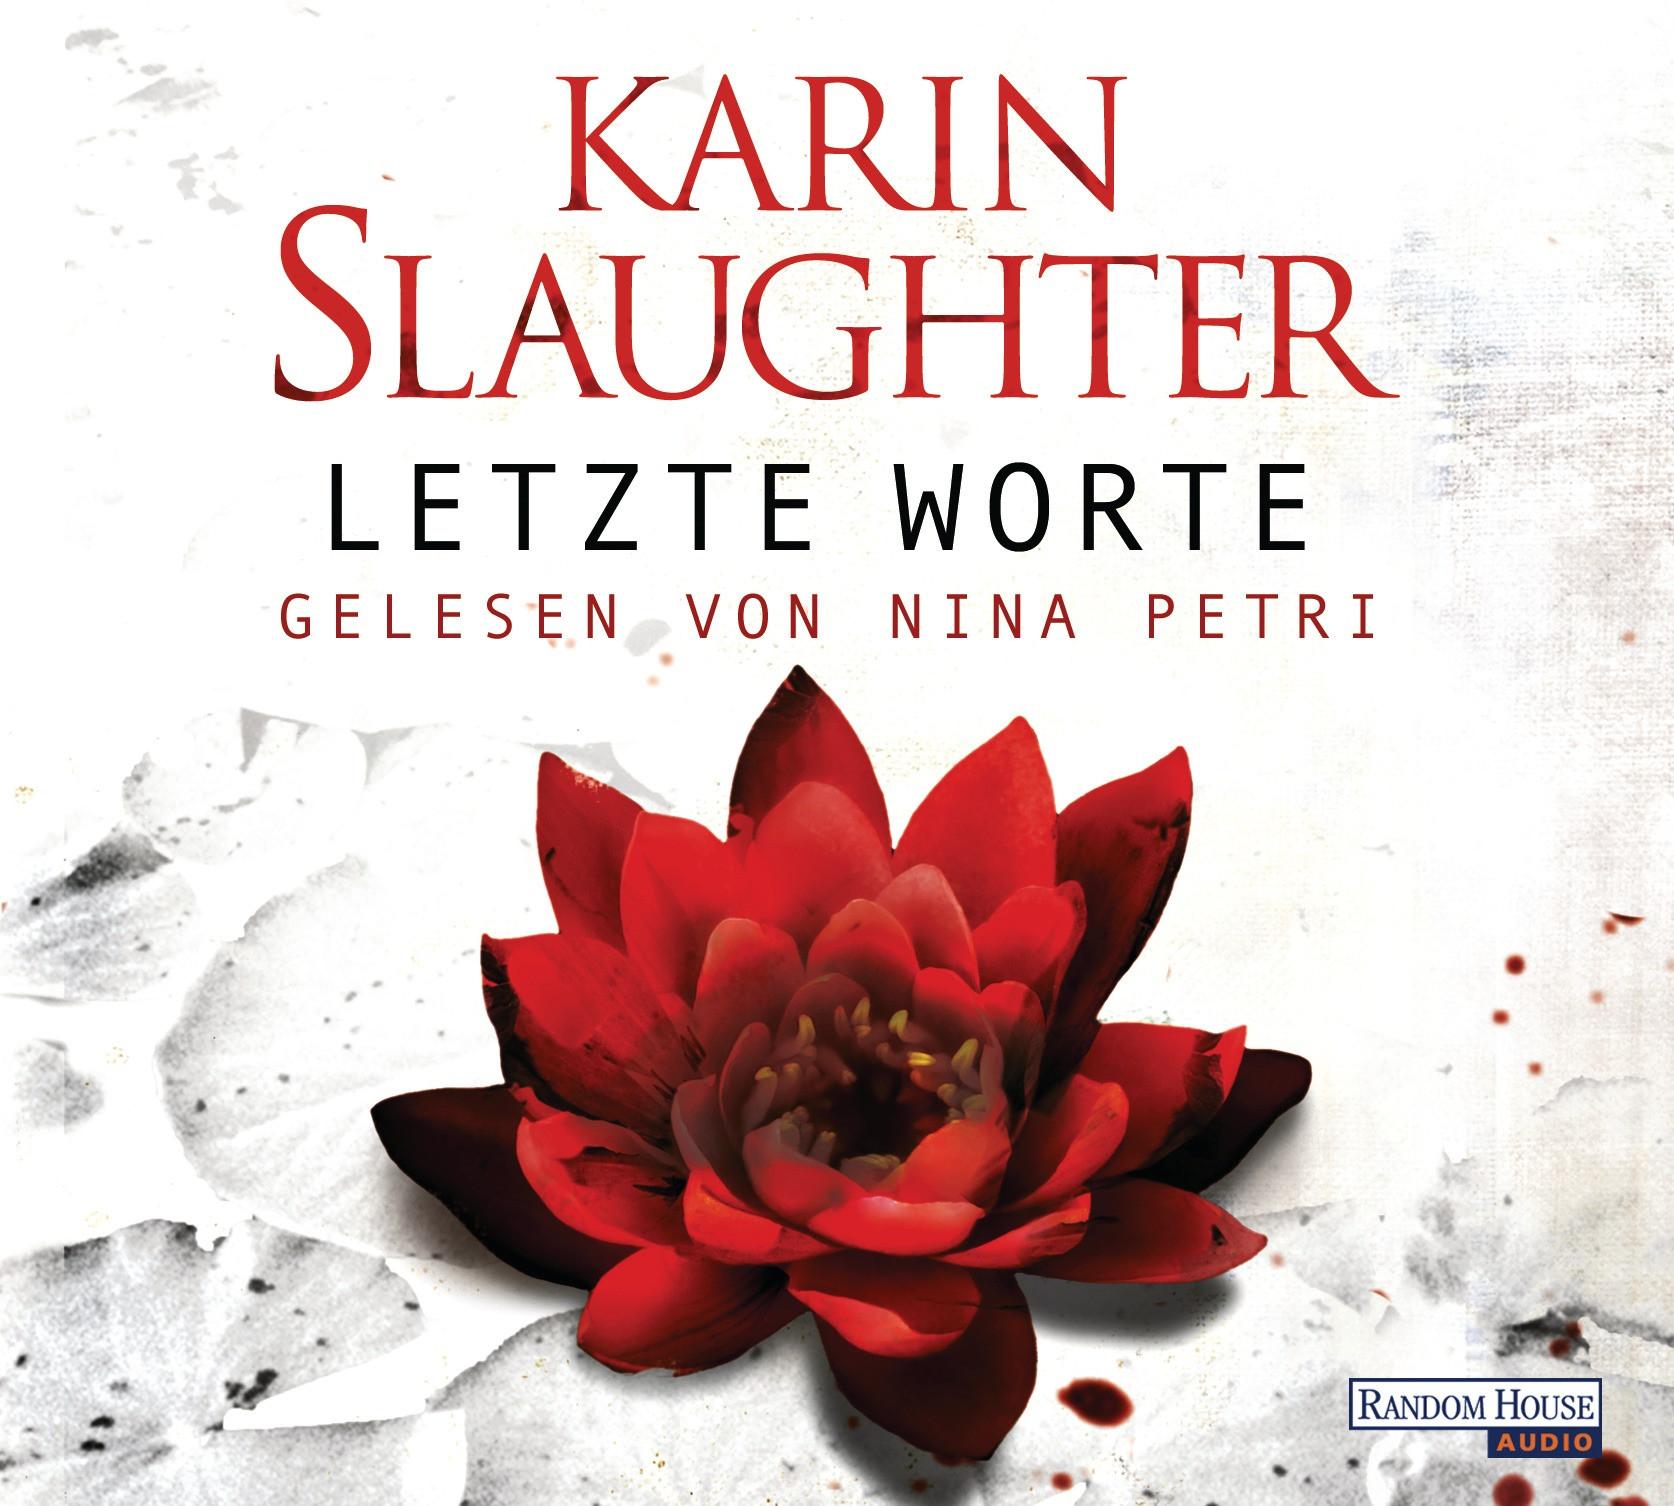 Karin Slaughter - Letzte Worte